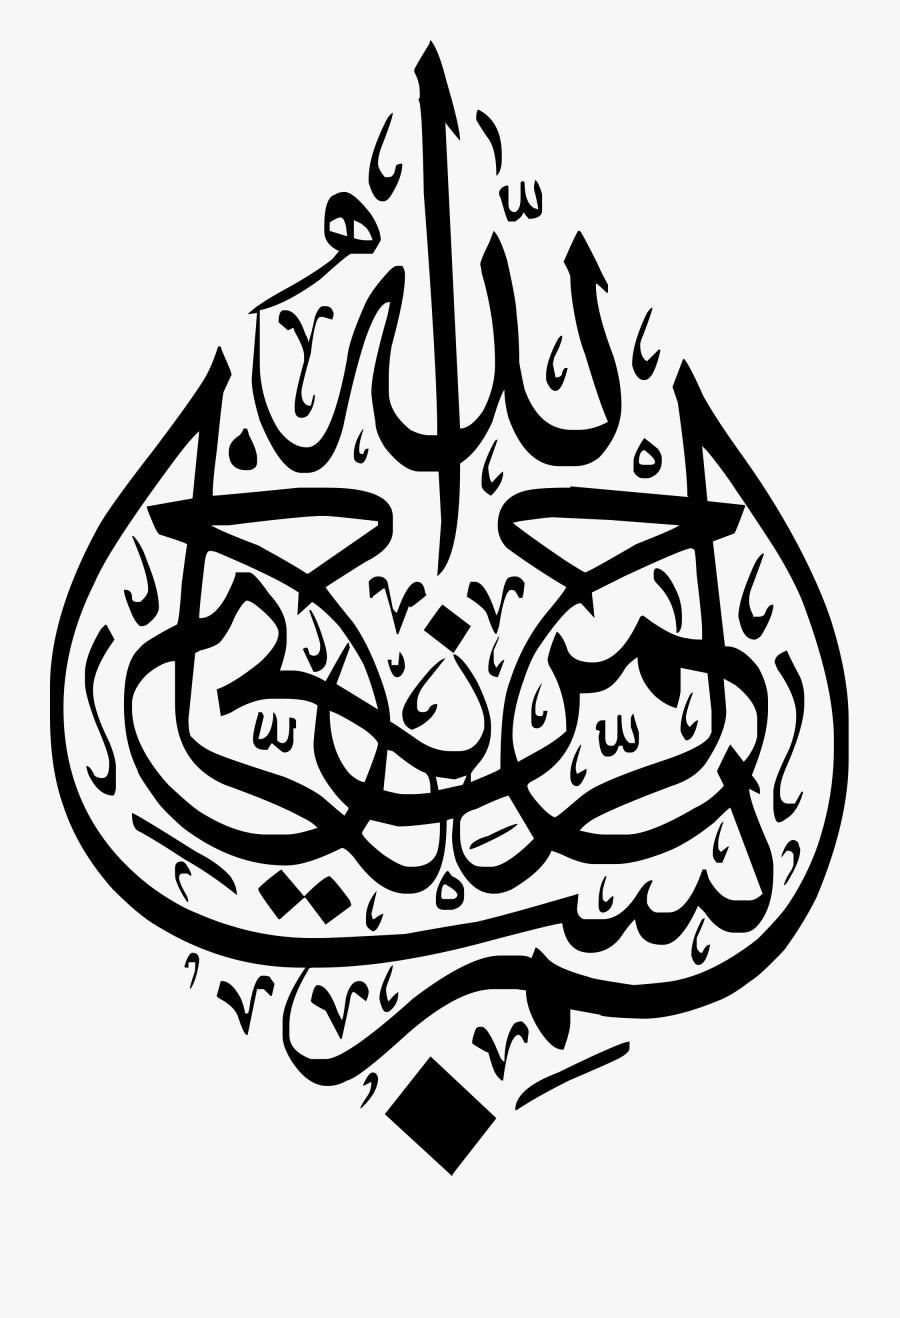 Bismillah Islamic Calligraphy Png, Transparent Clipart